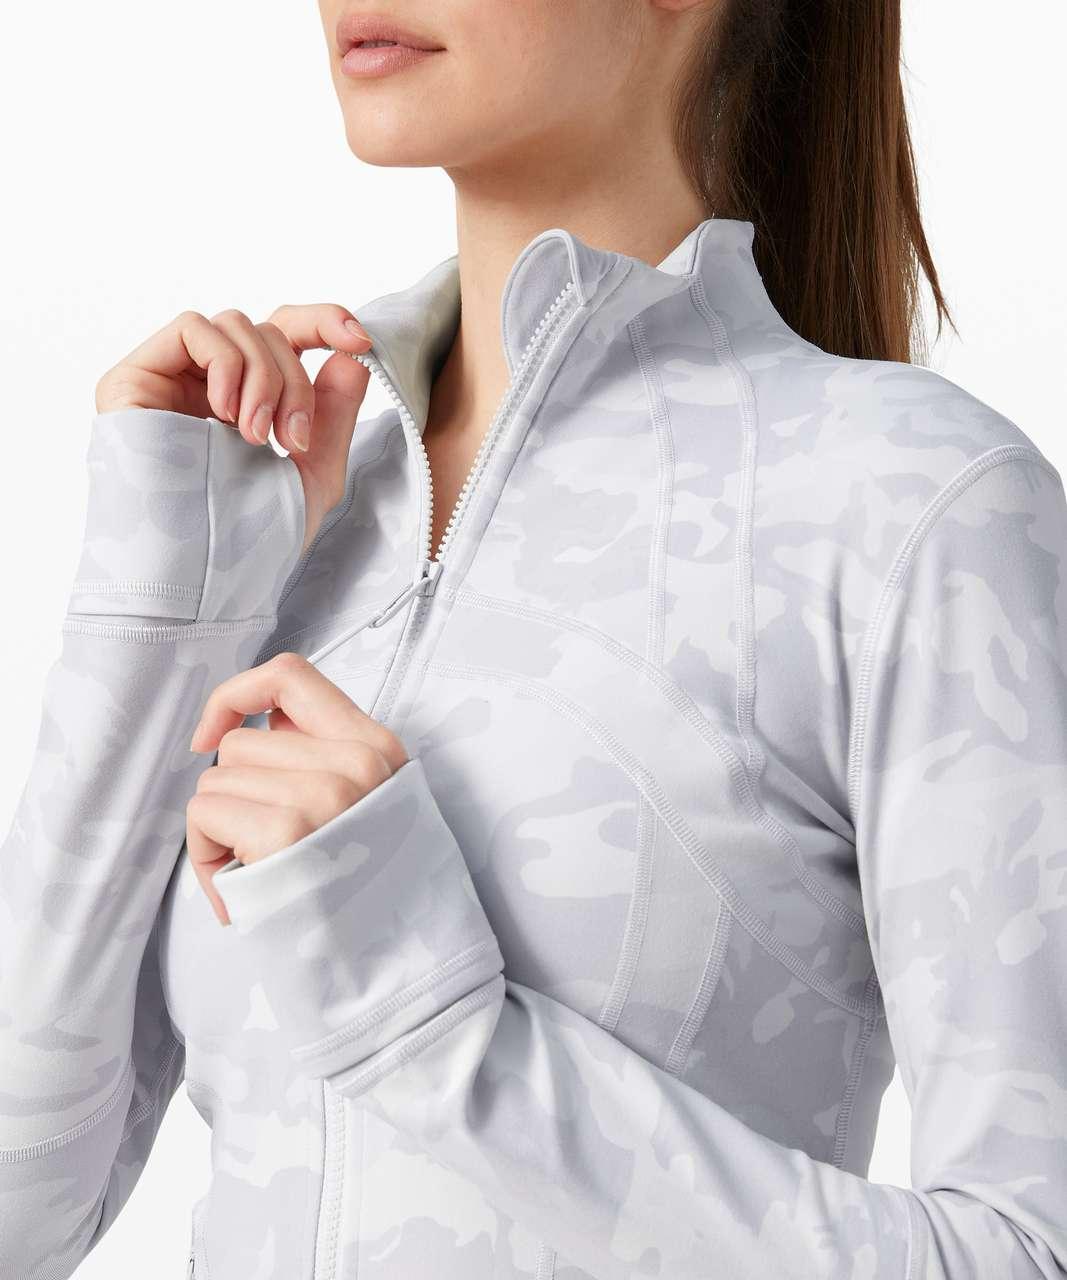 Lululemon Define Jacket - Incognito Camo Alpine White Multi